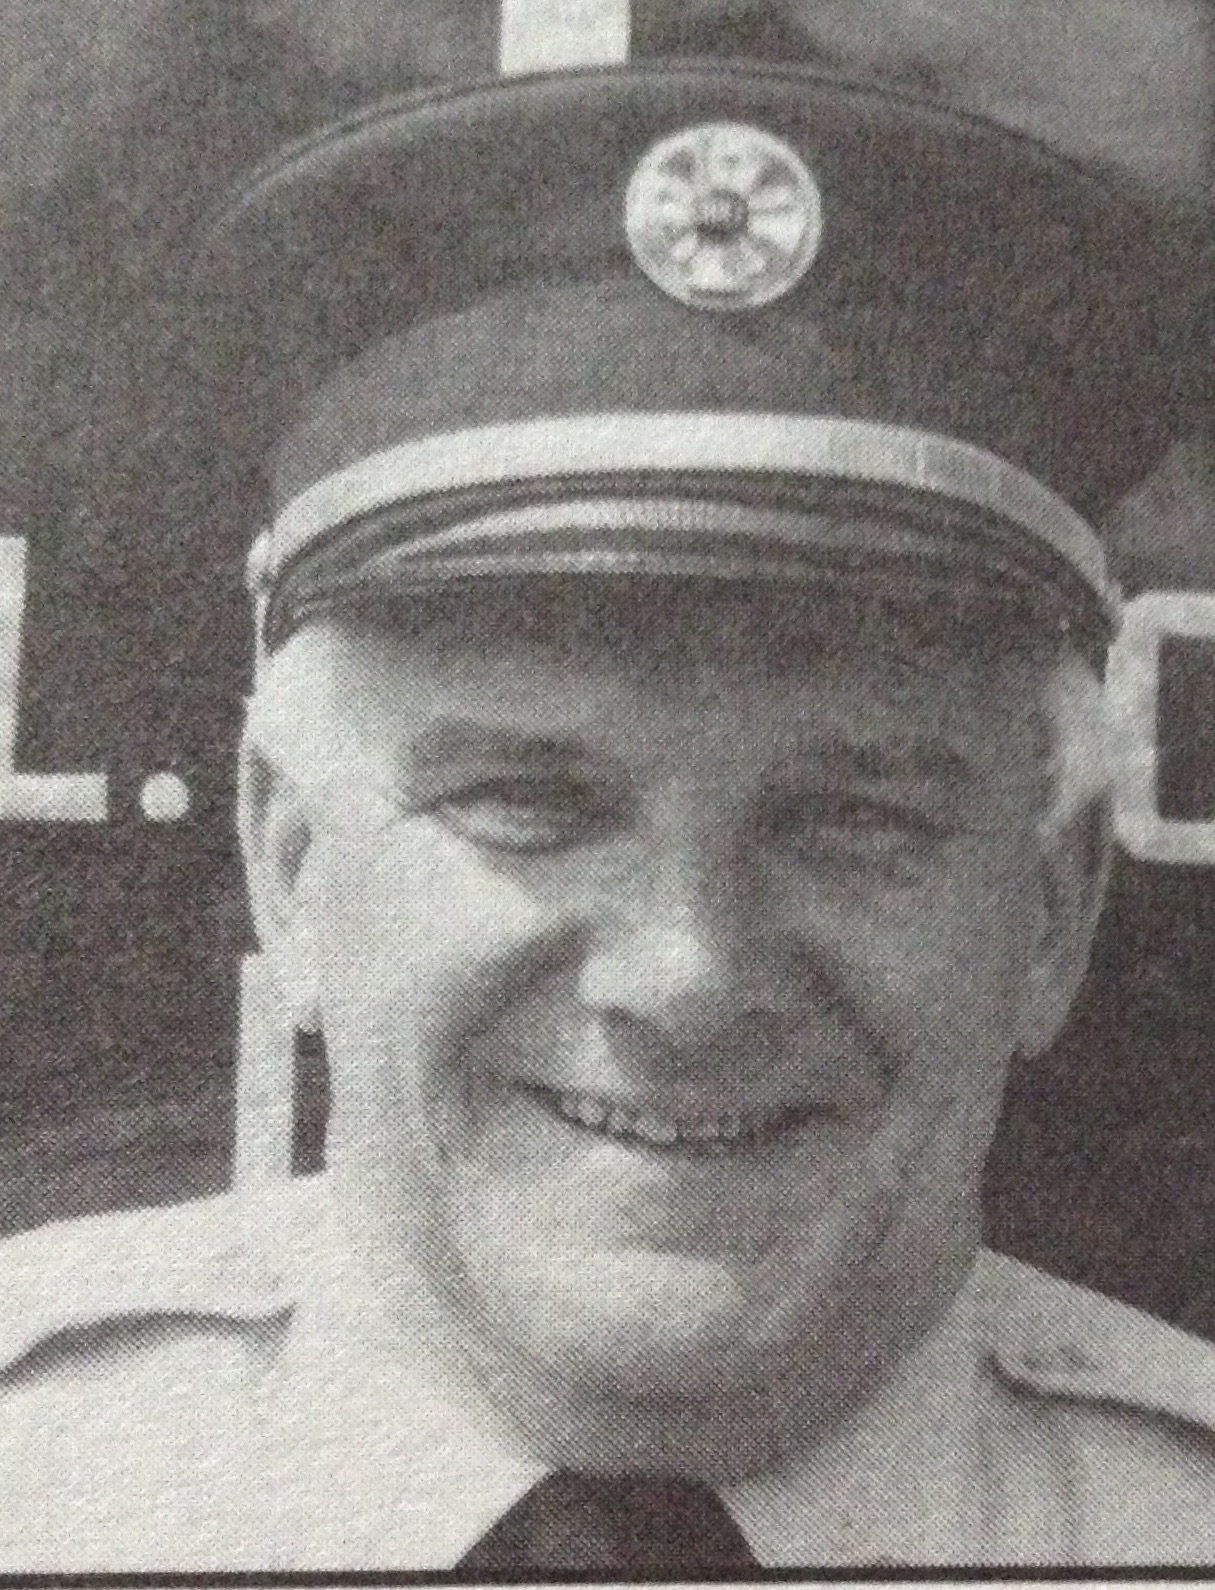 Chief John Murphy